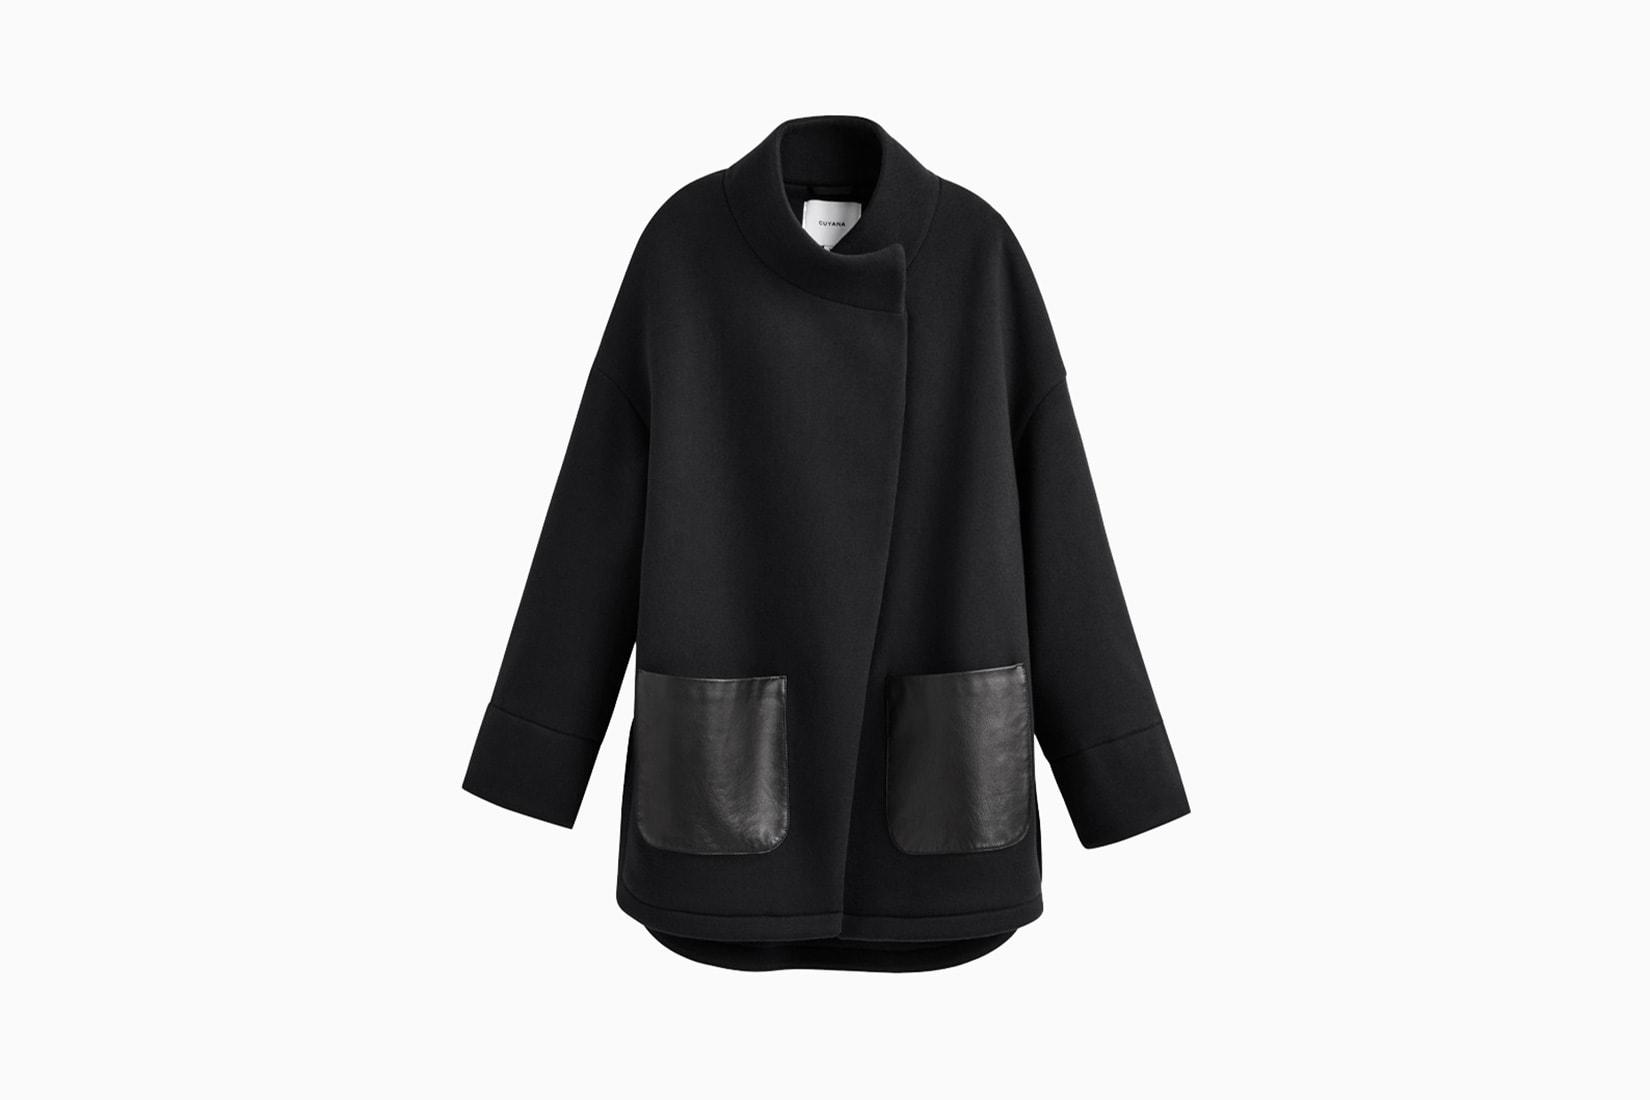 best winter coats women cuyana fleece jacket review - Luxe Digital